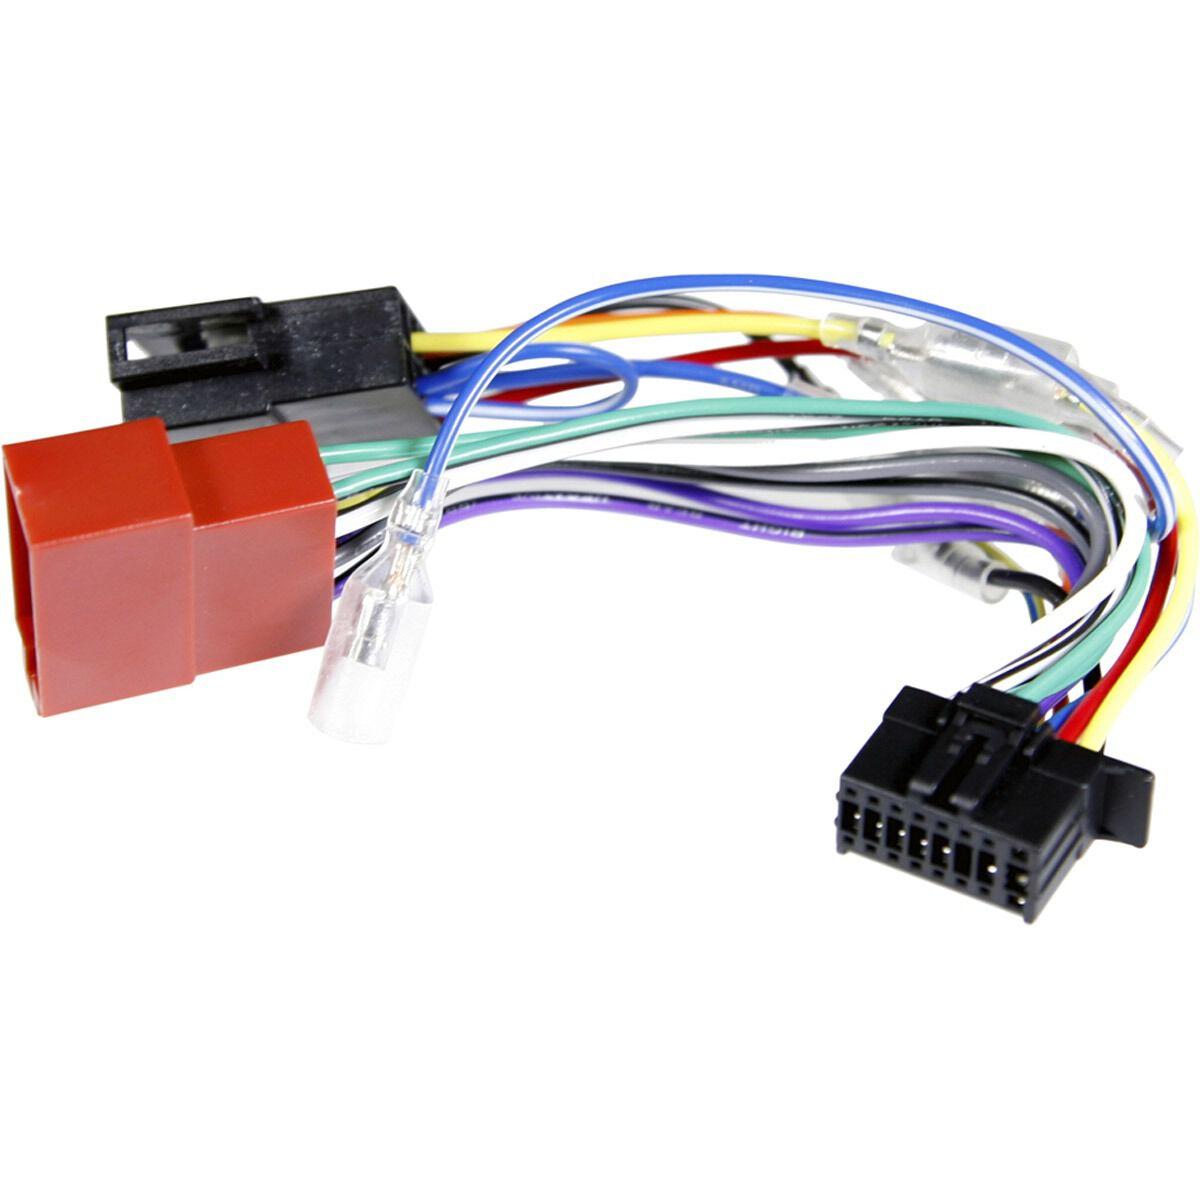 nissan pulsar n15 radio wiring diagram stratocaster with 5 way switch harnesses supercheap auto australia aerpro harness suit jvc head units app8jvc5 scaau hi res